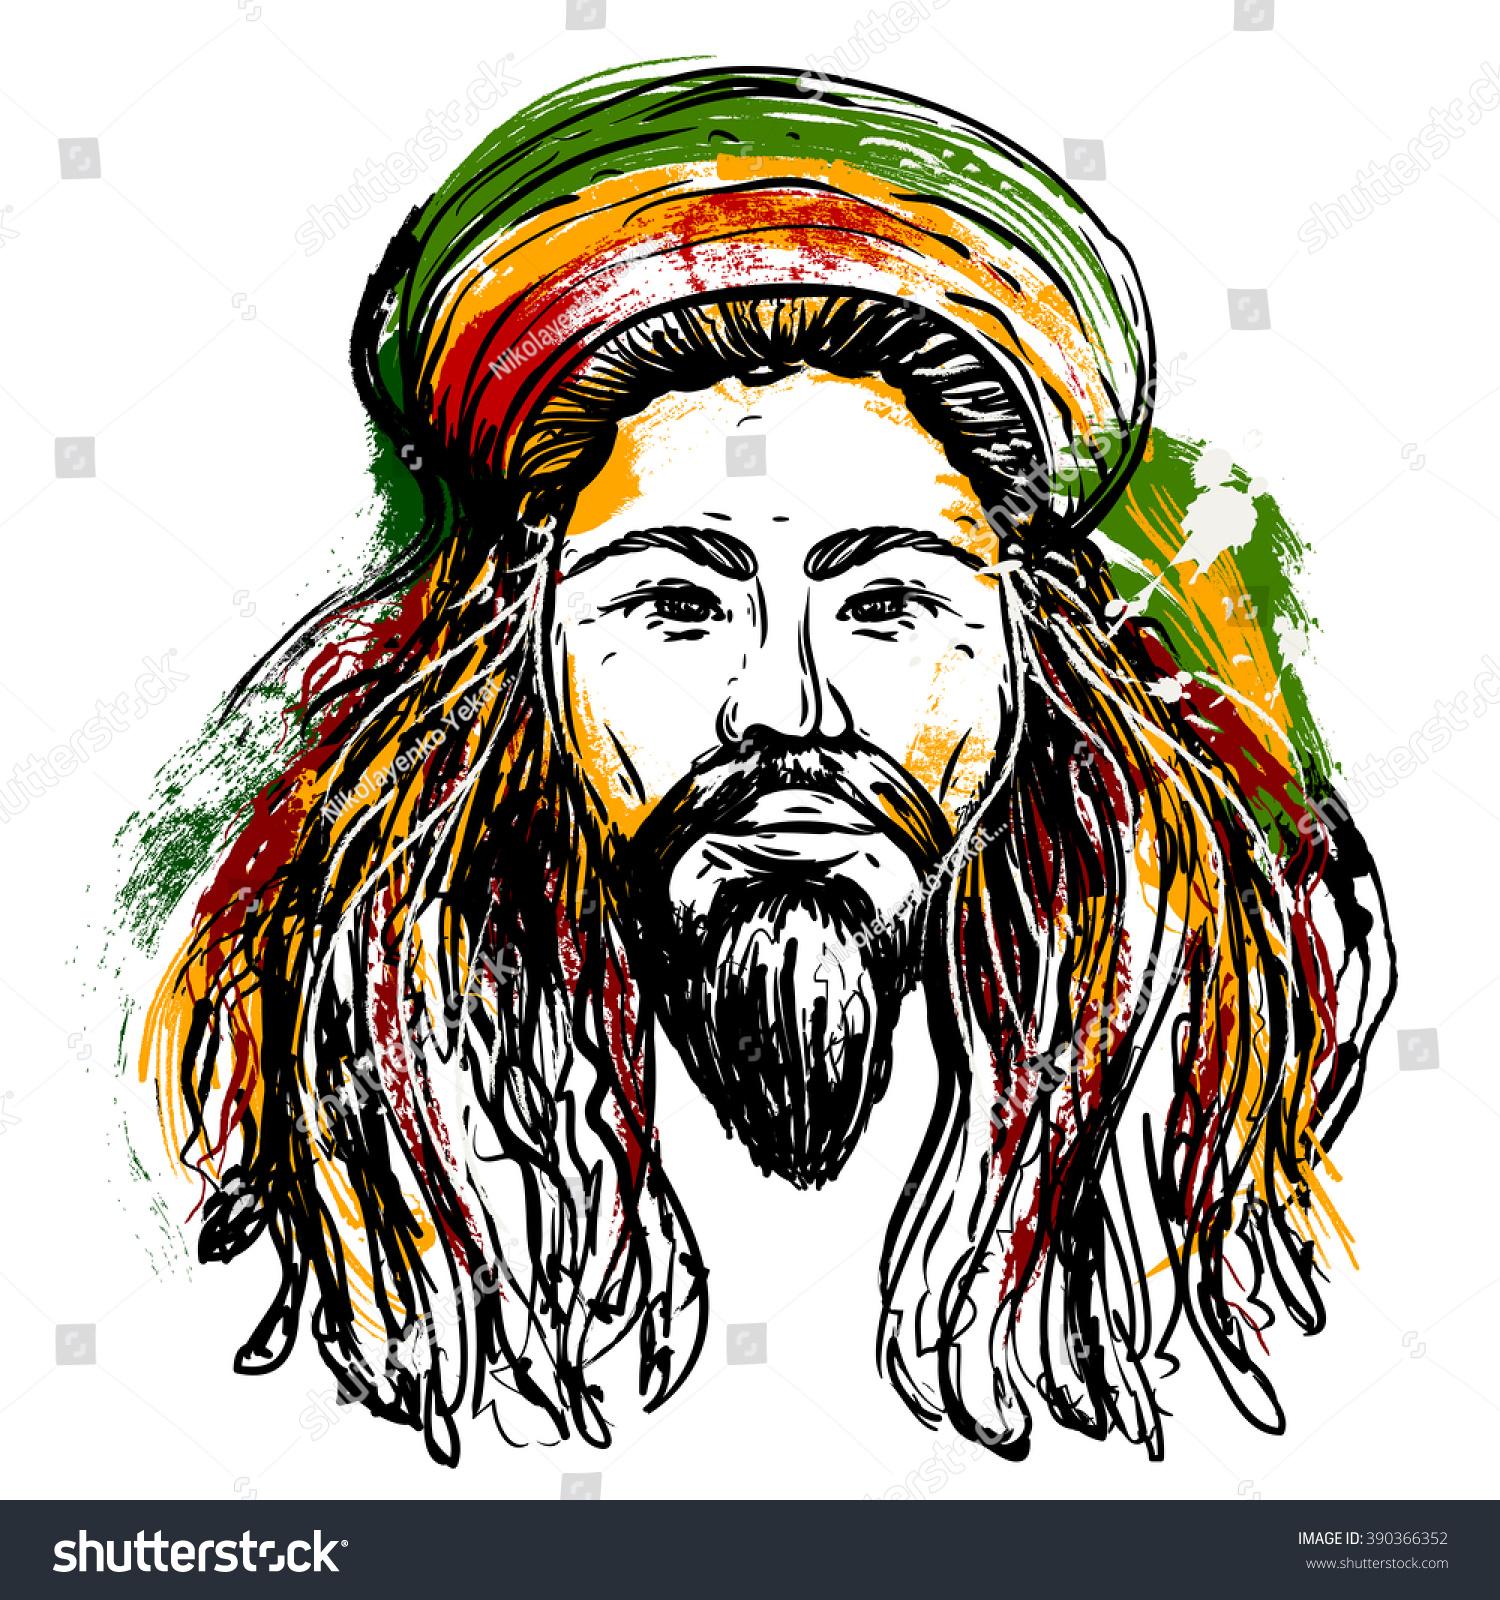 Design t shirt reggae - Portrait Of Rastaman Jamaica Theme Reggae Concept Design Tattoo Art Hand Drawn